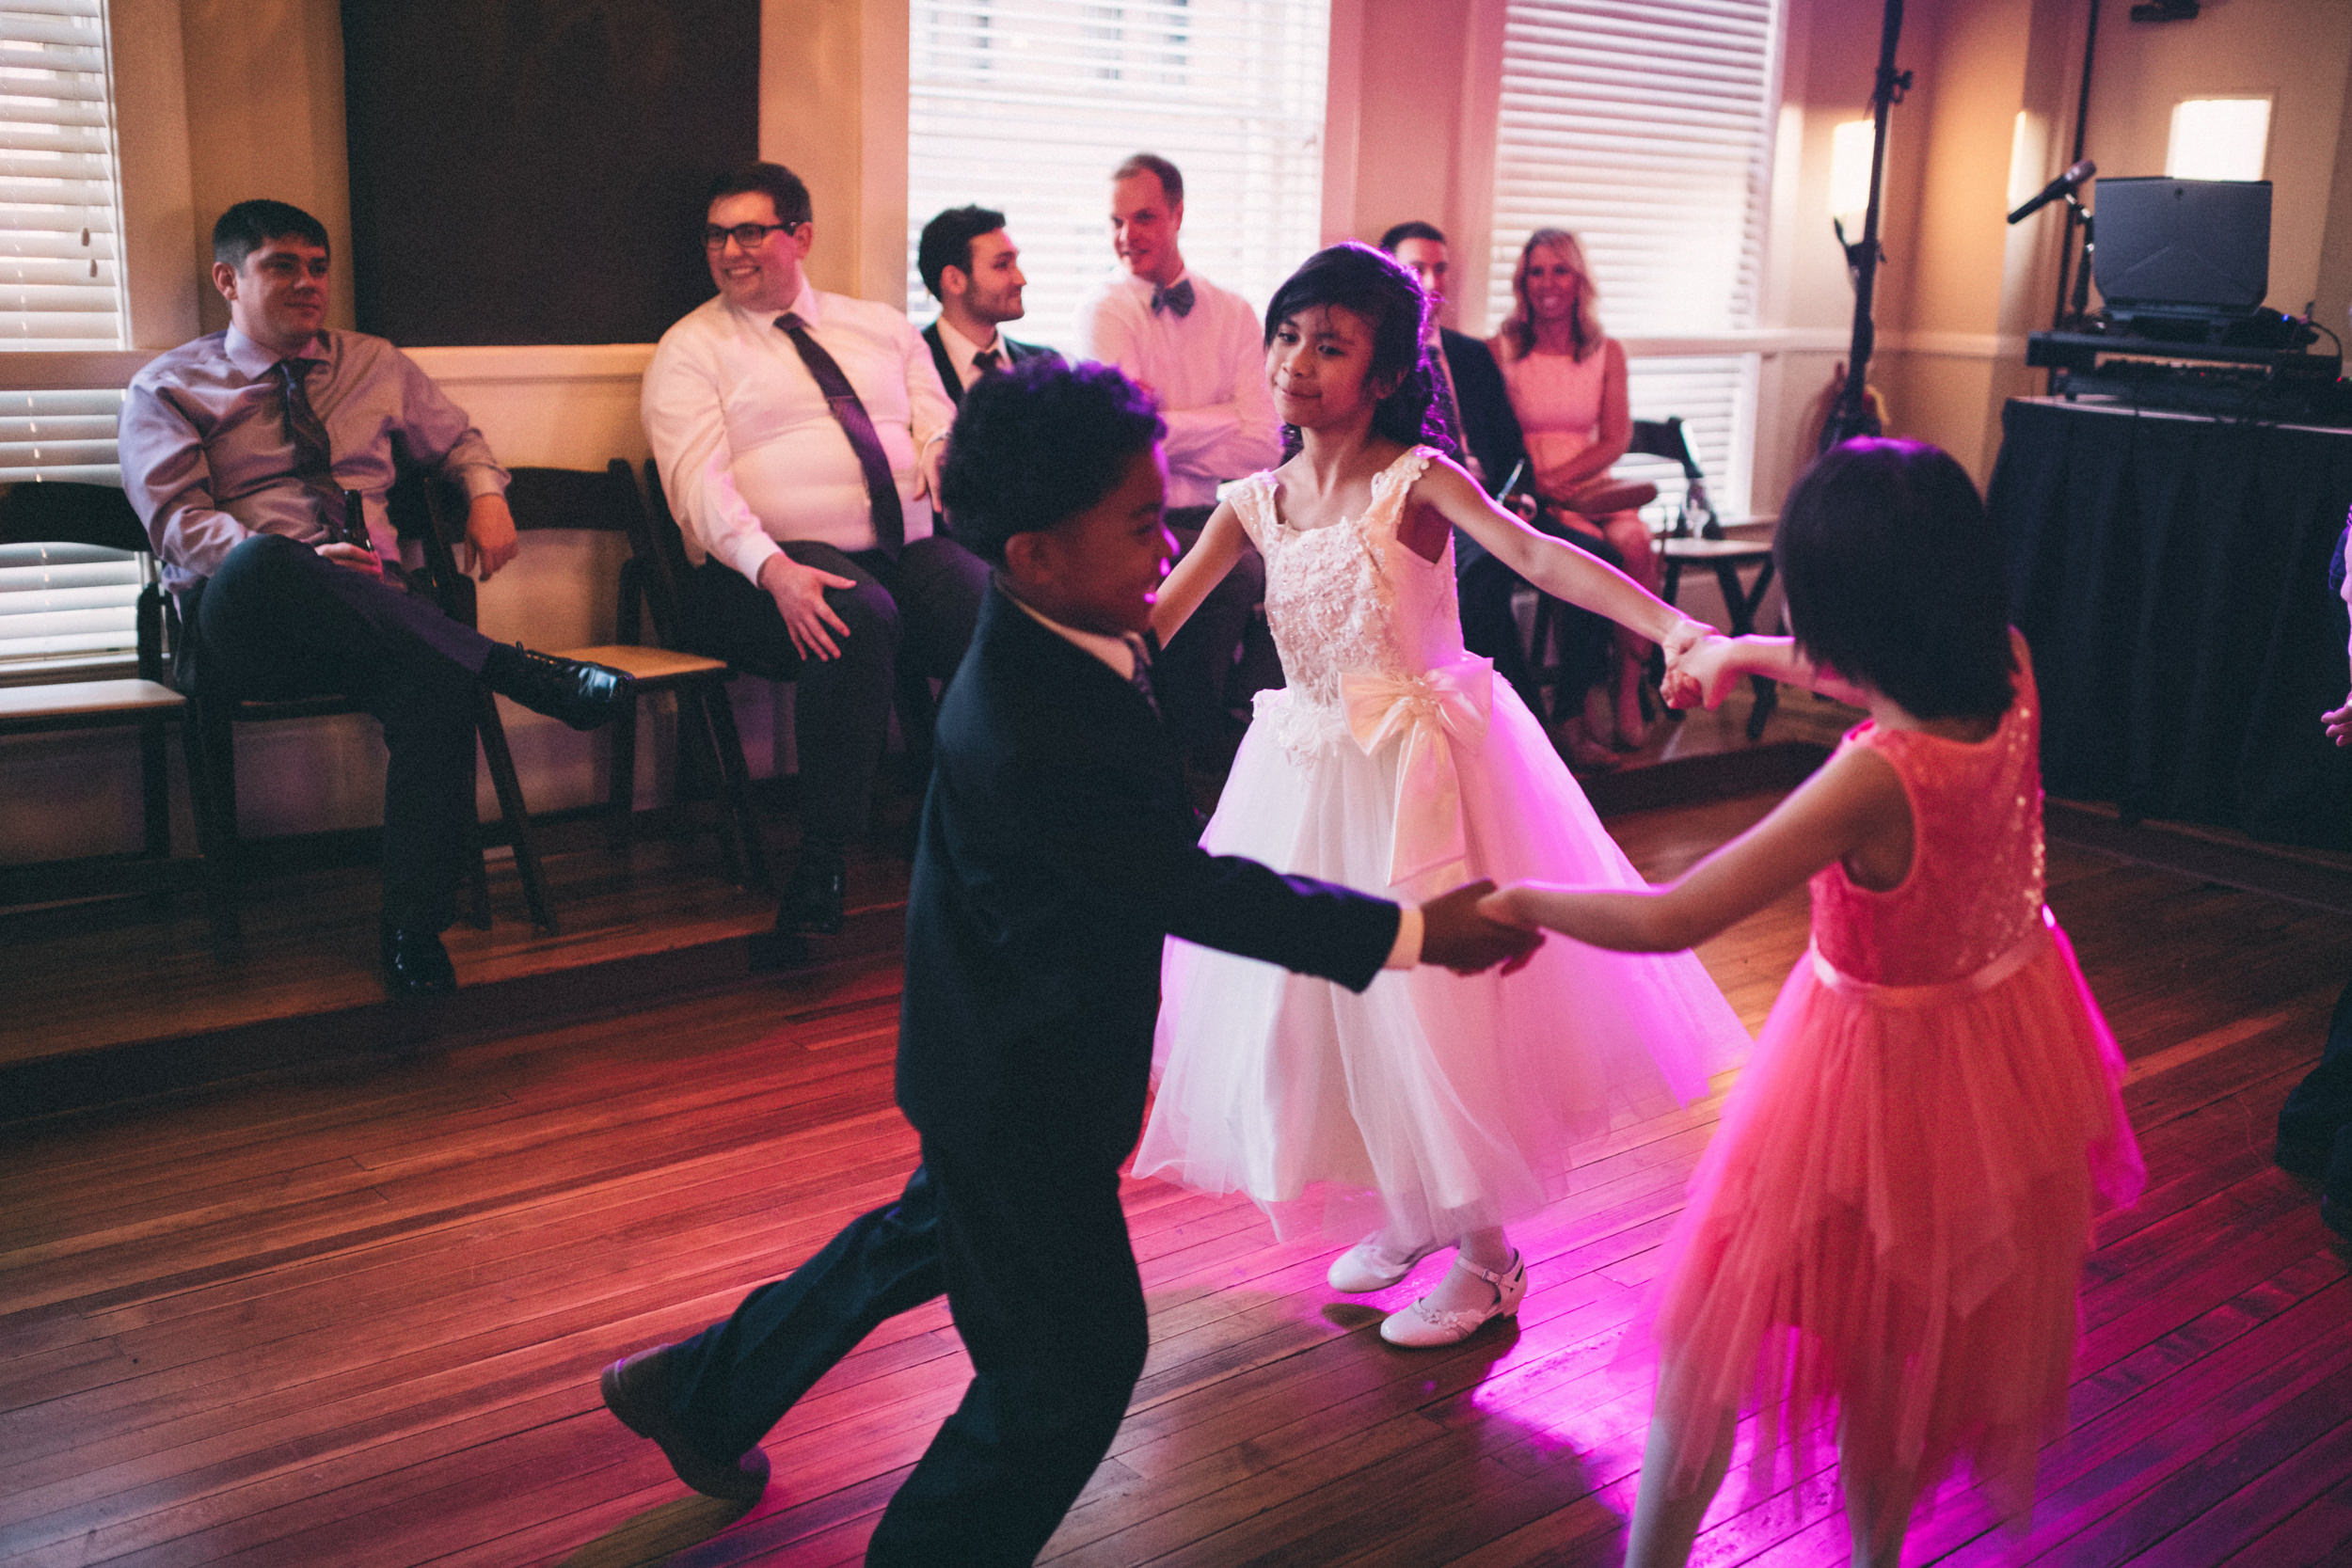 lauren-dean-wedding-grand-lodge-kentucky-sarah-katherine-davis-photography-595edit.jpg